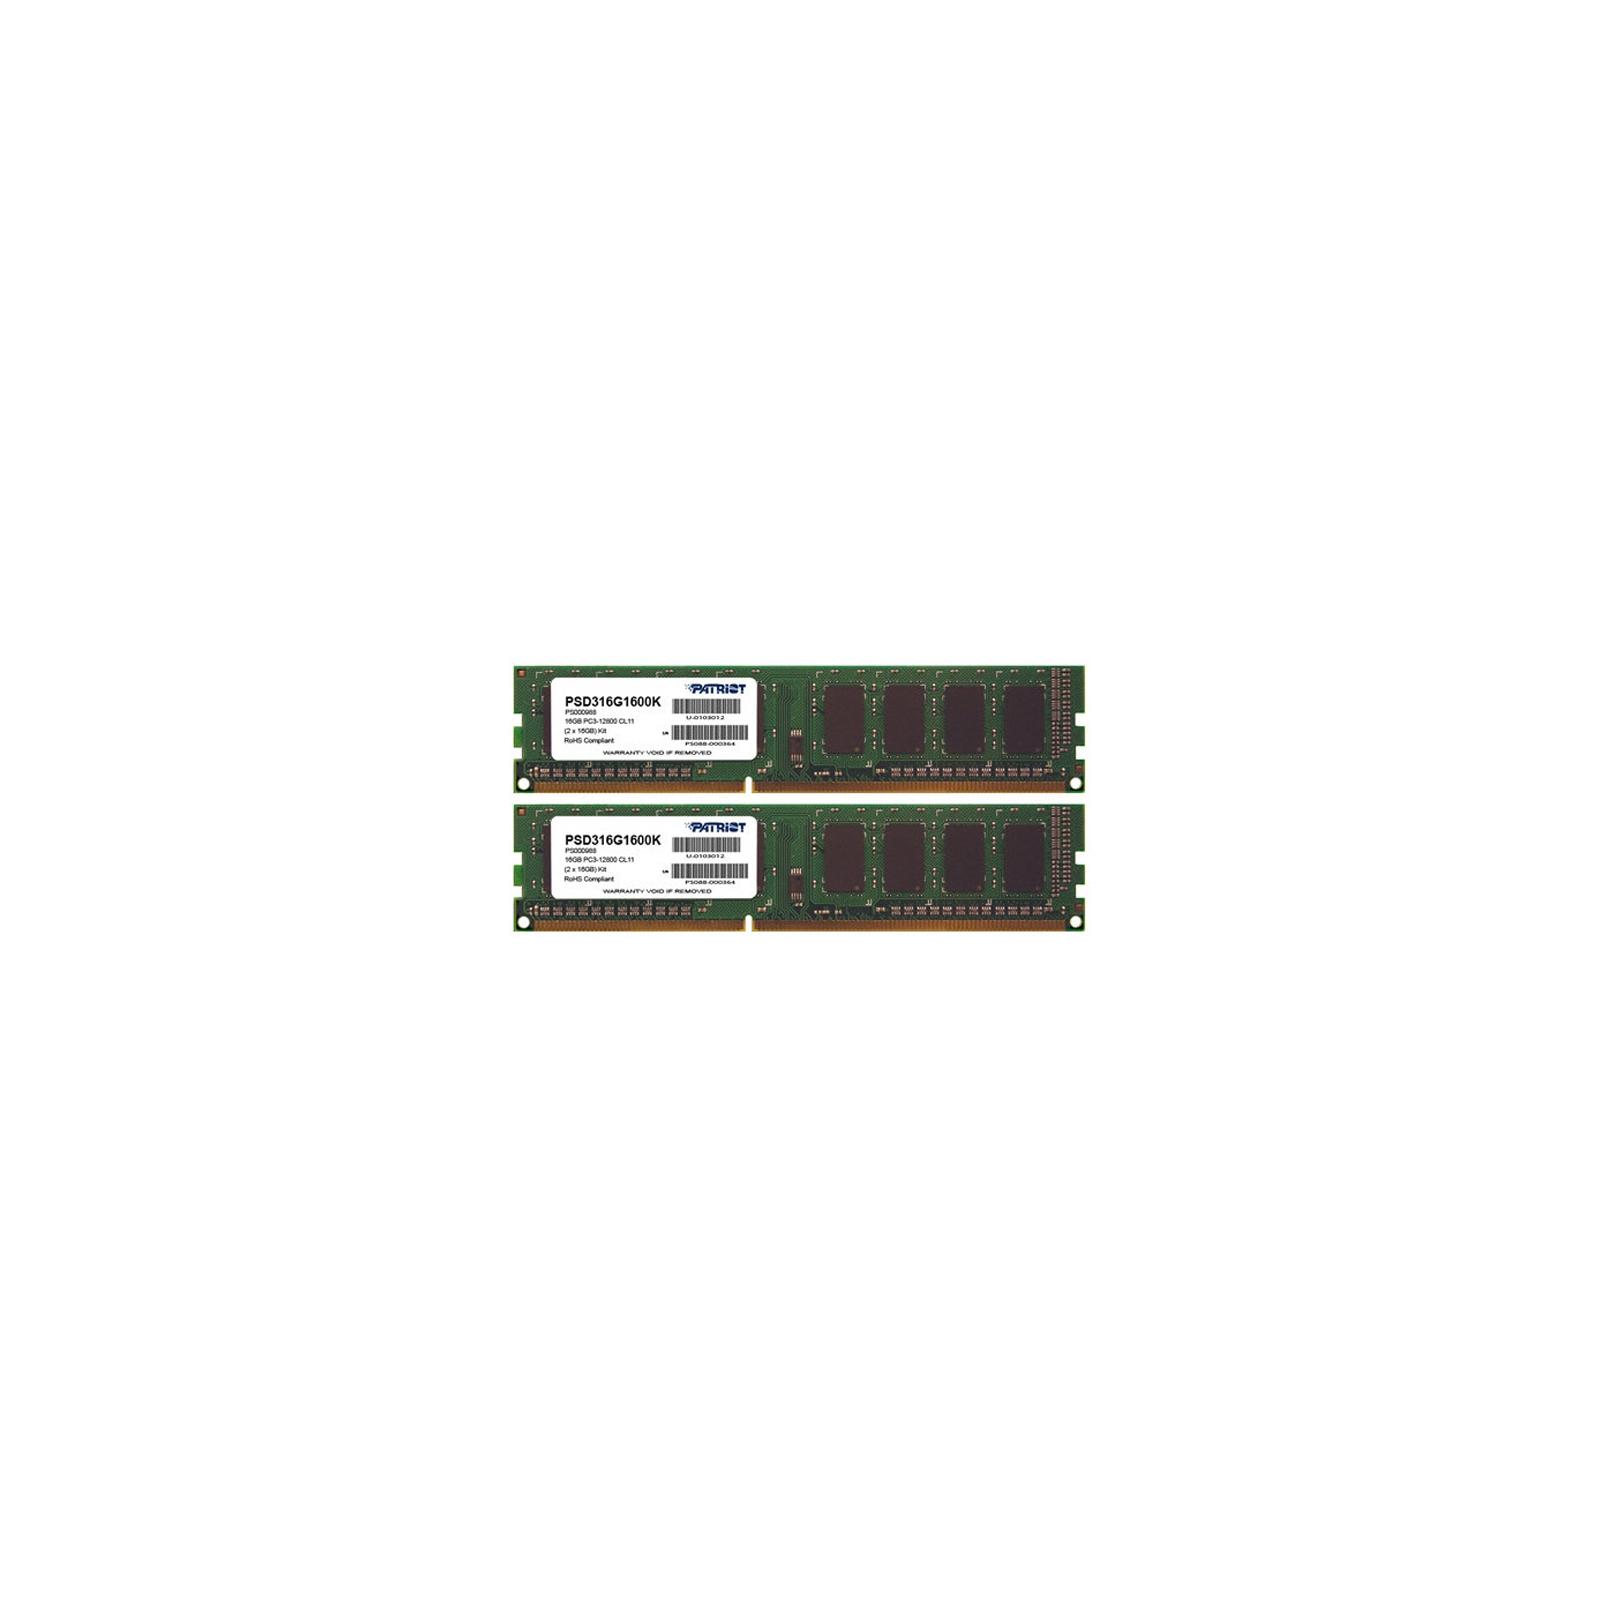 Модуль памяти для компьютера DDR3 16GB (2x8GB) 1600 MHz Patriot (PSD316G1600K)